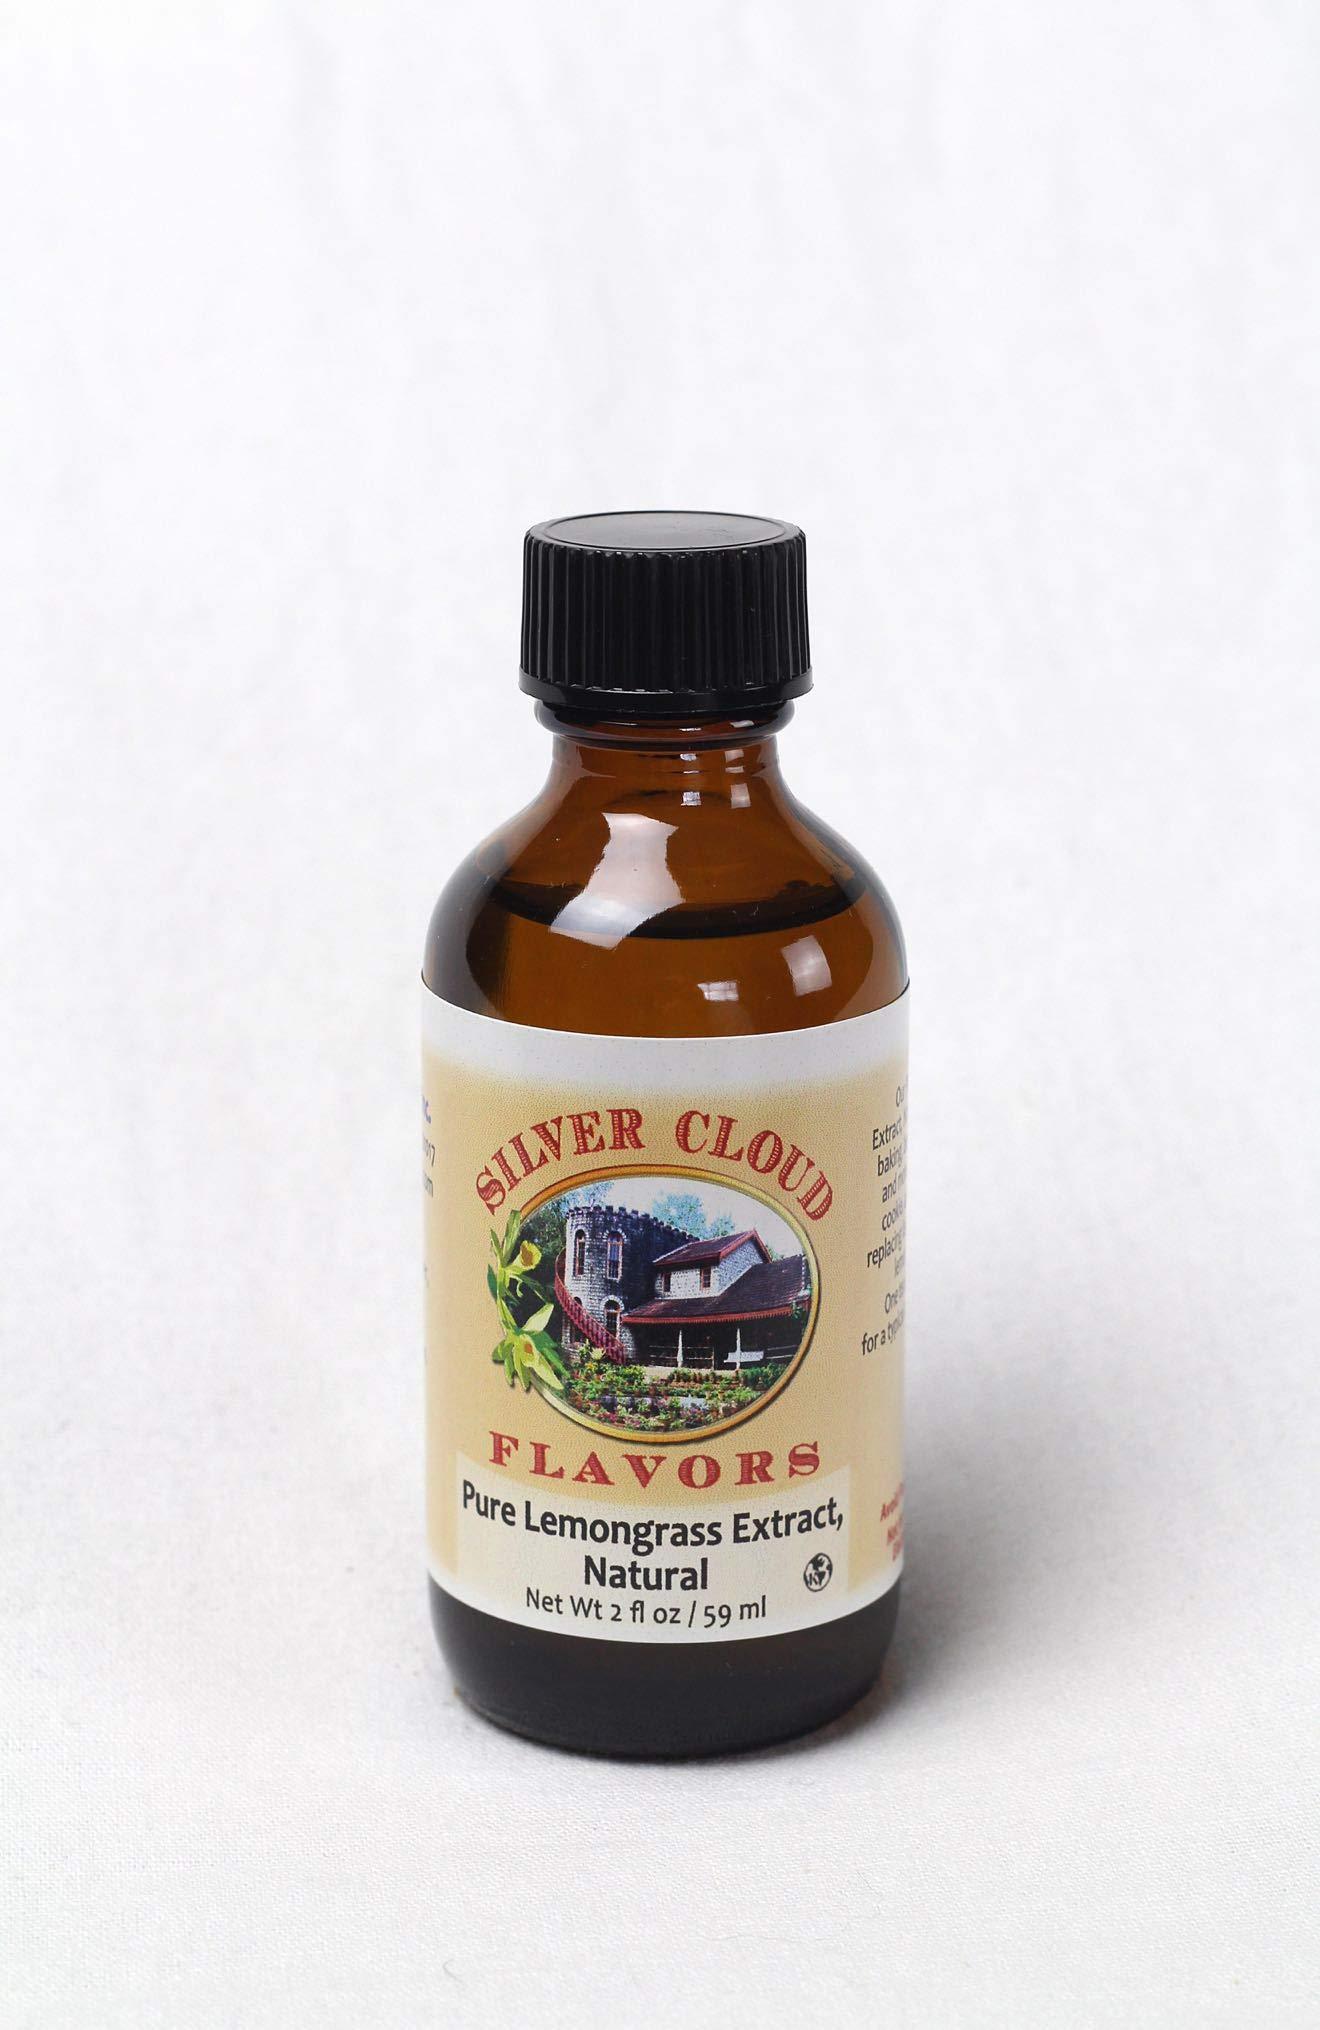 Pure Lemongrass Extract, Natural - 2 fl. oz. bottle